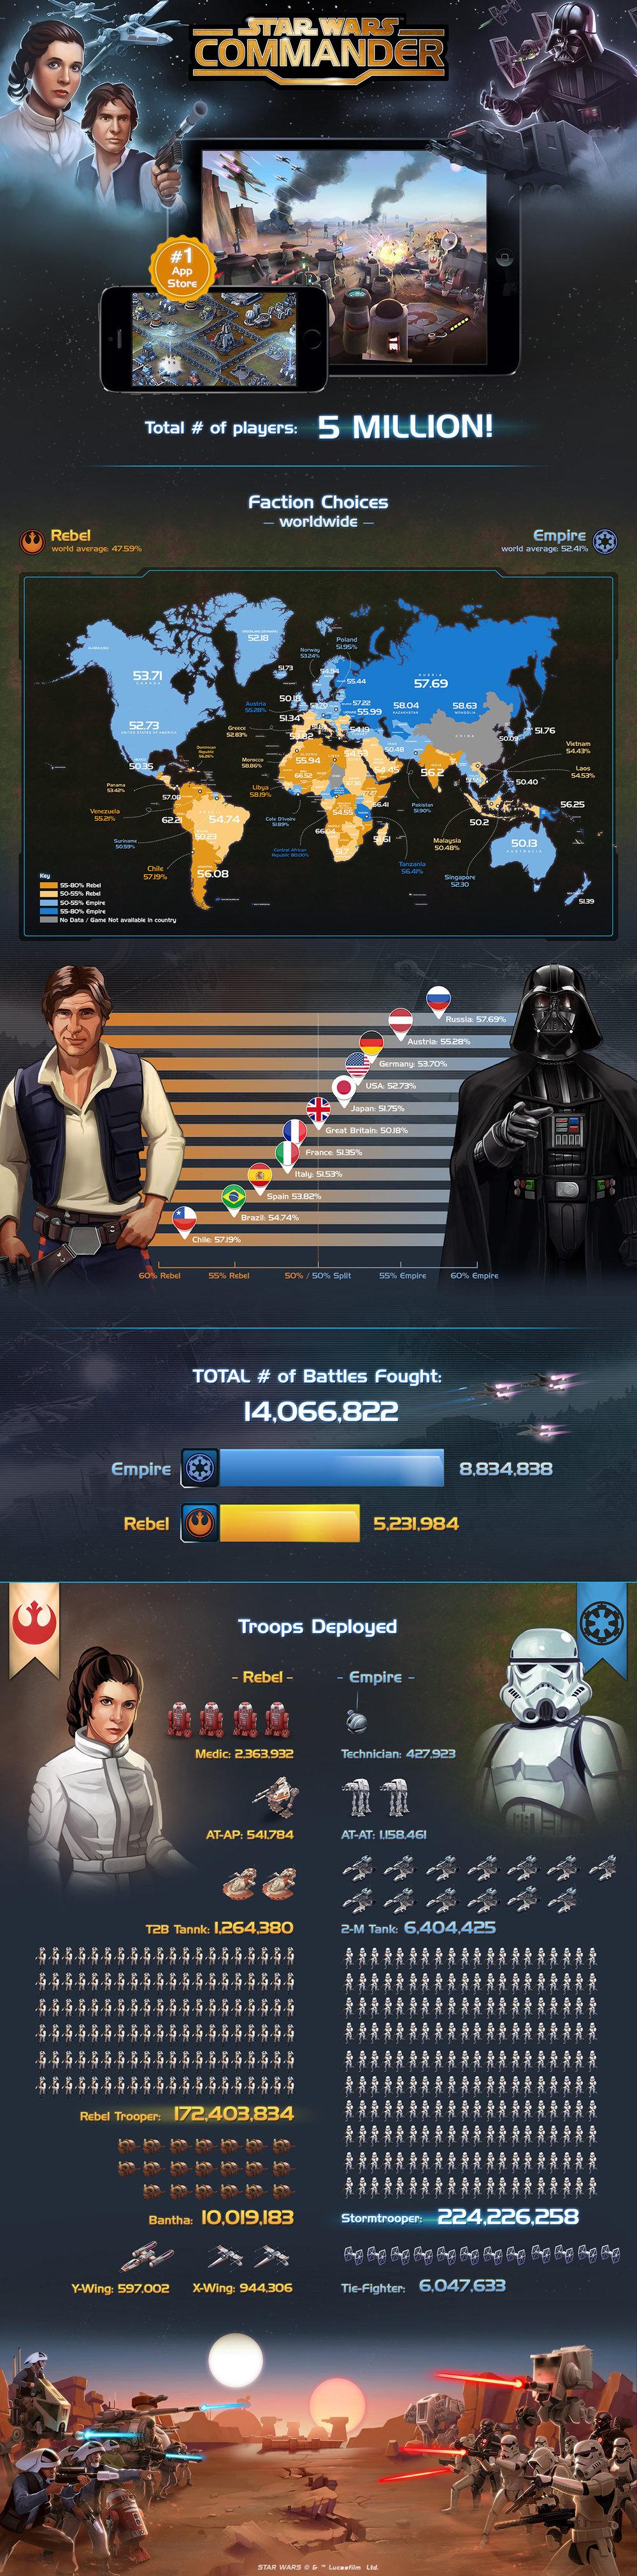 Star Wars Commander infographic